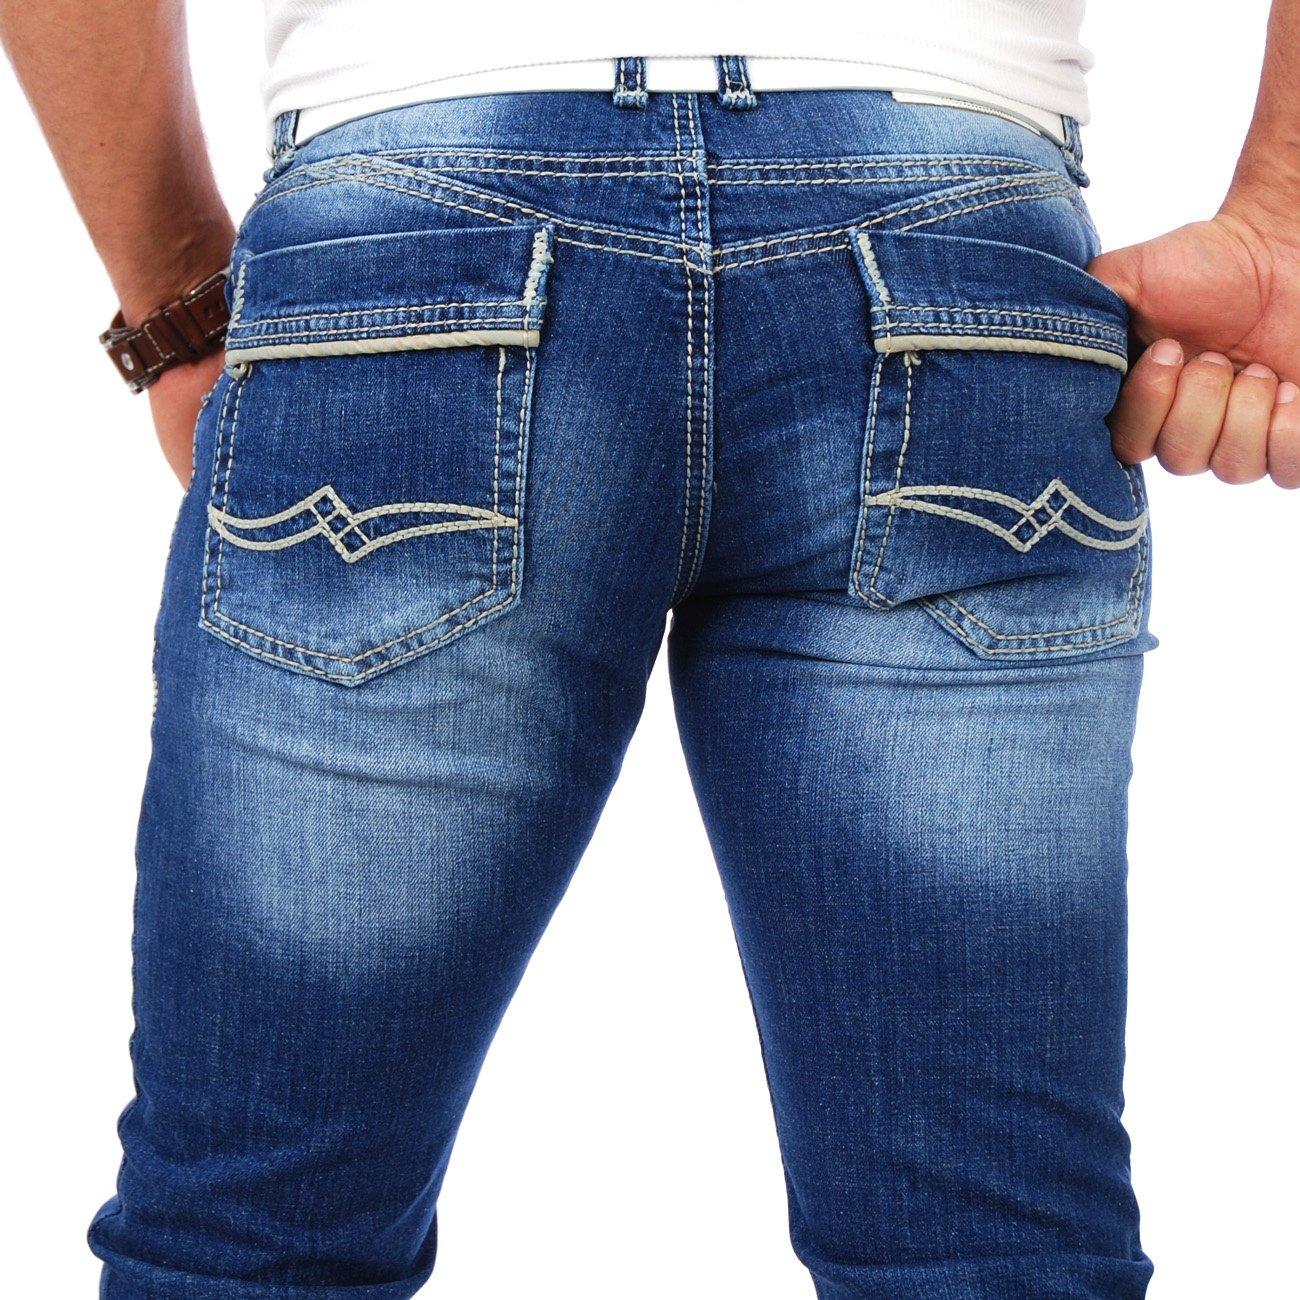 coole herren jeans rusty neal 8323 6 coole jeans g nstig. Black Bedroom Furniture Sets. Home Design Ideas